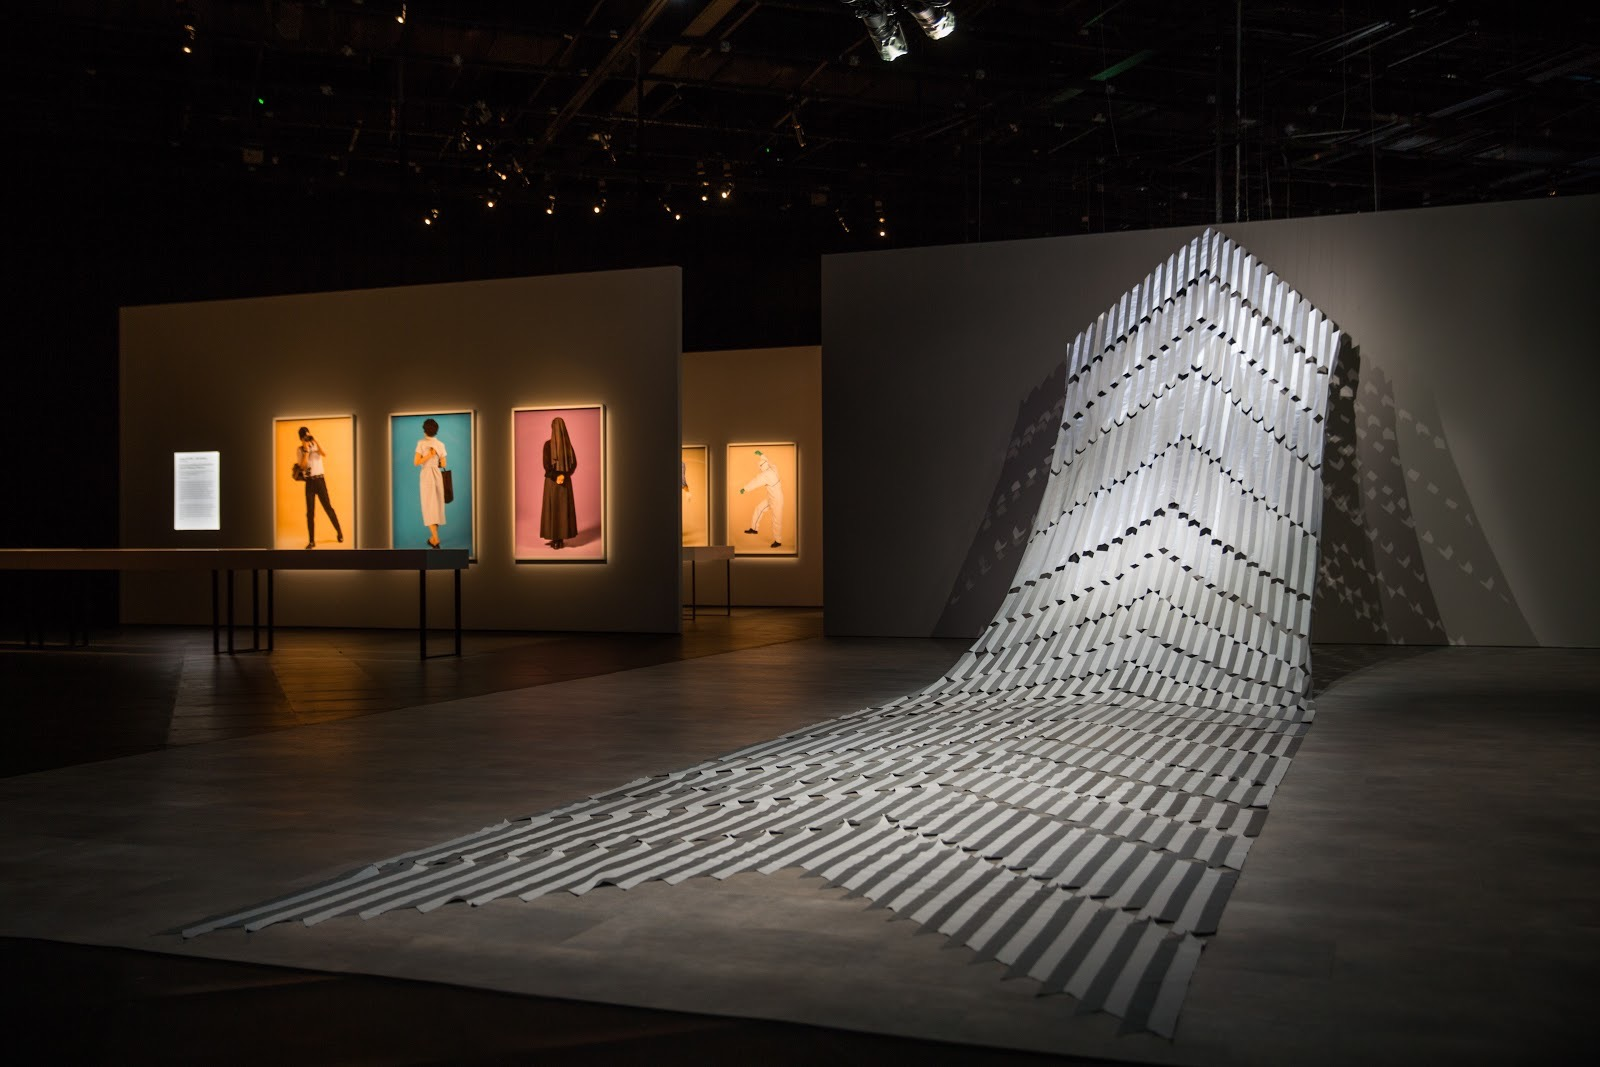 Empowering Minorities and Rewriting Narratives: Why Art Matters